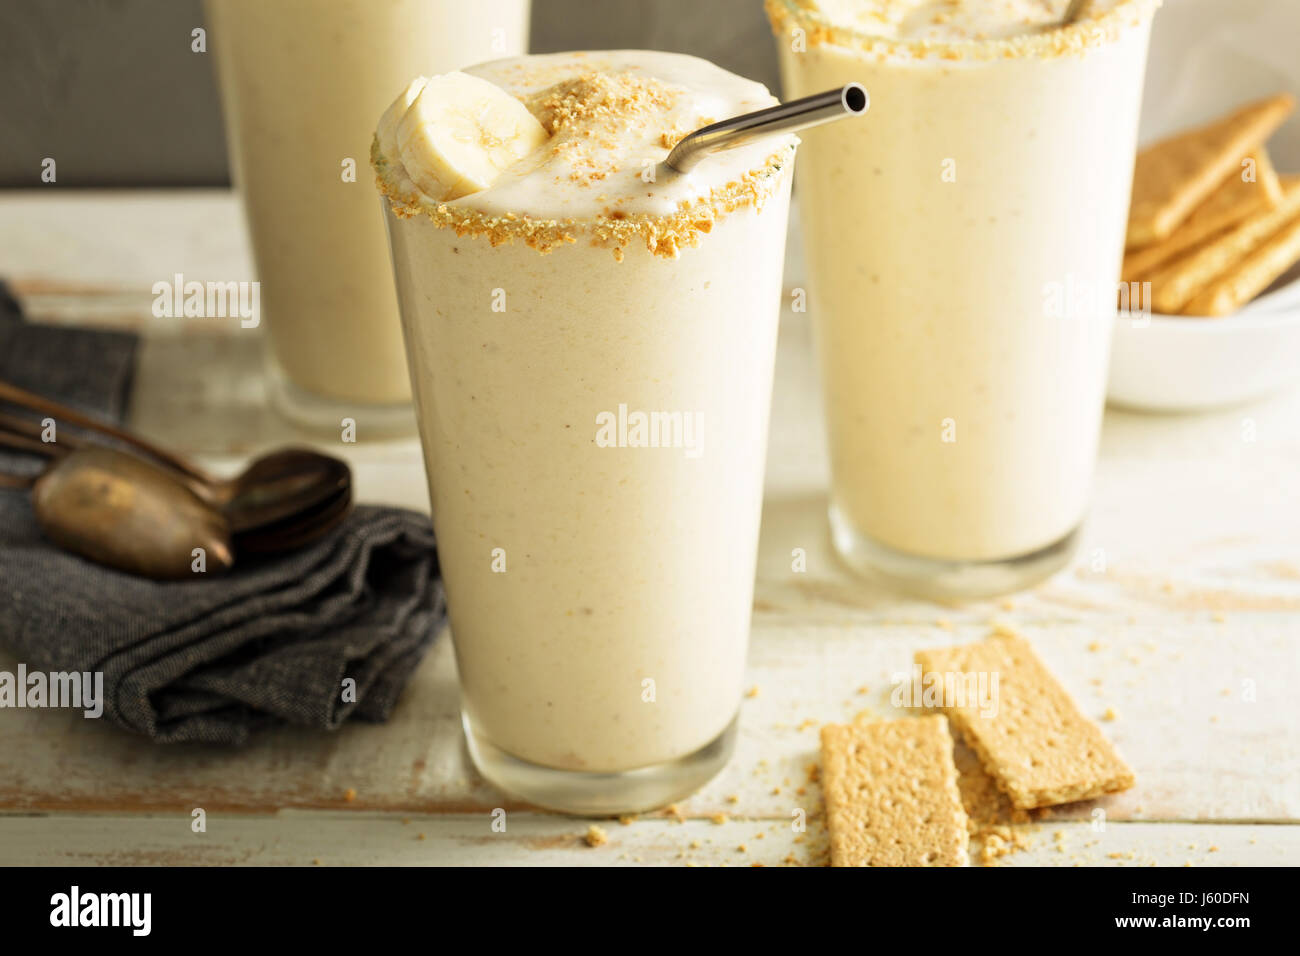 Banana and cookies milkshake - Stock Image